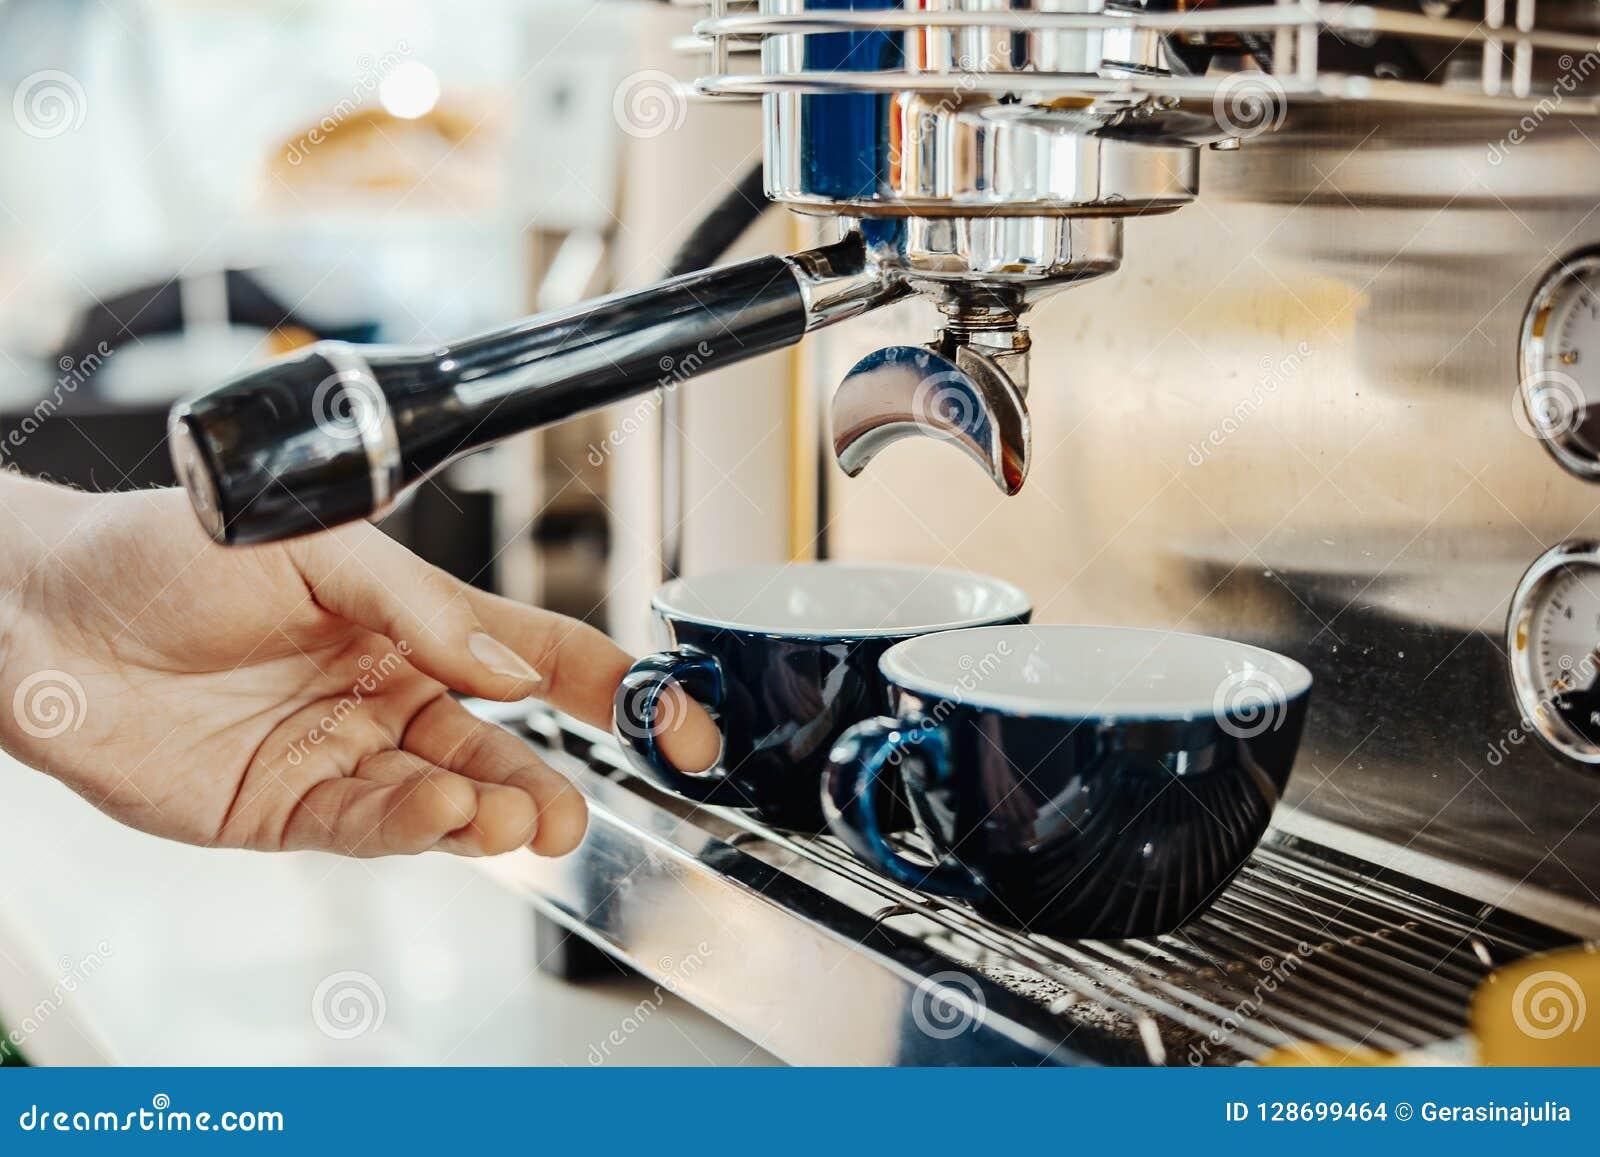 Barista που προετοιμάζει το cappuccino με τη μηχανή καφέ Έννοια προετοιμασιών καφέ